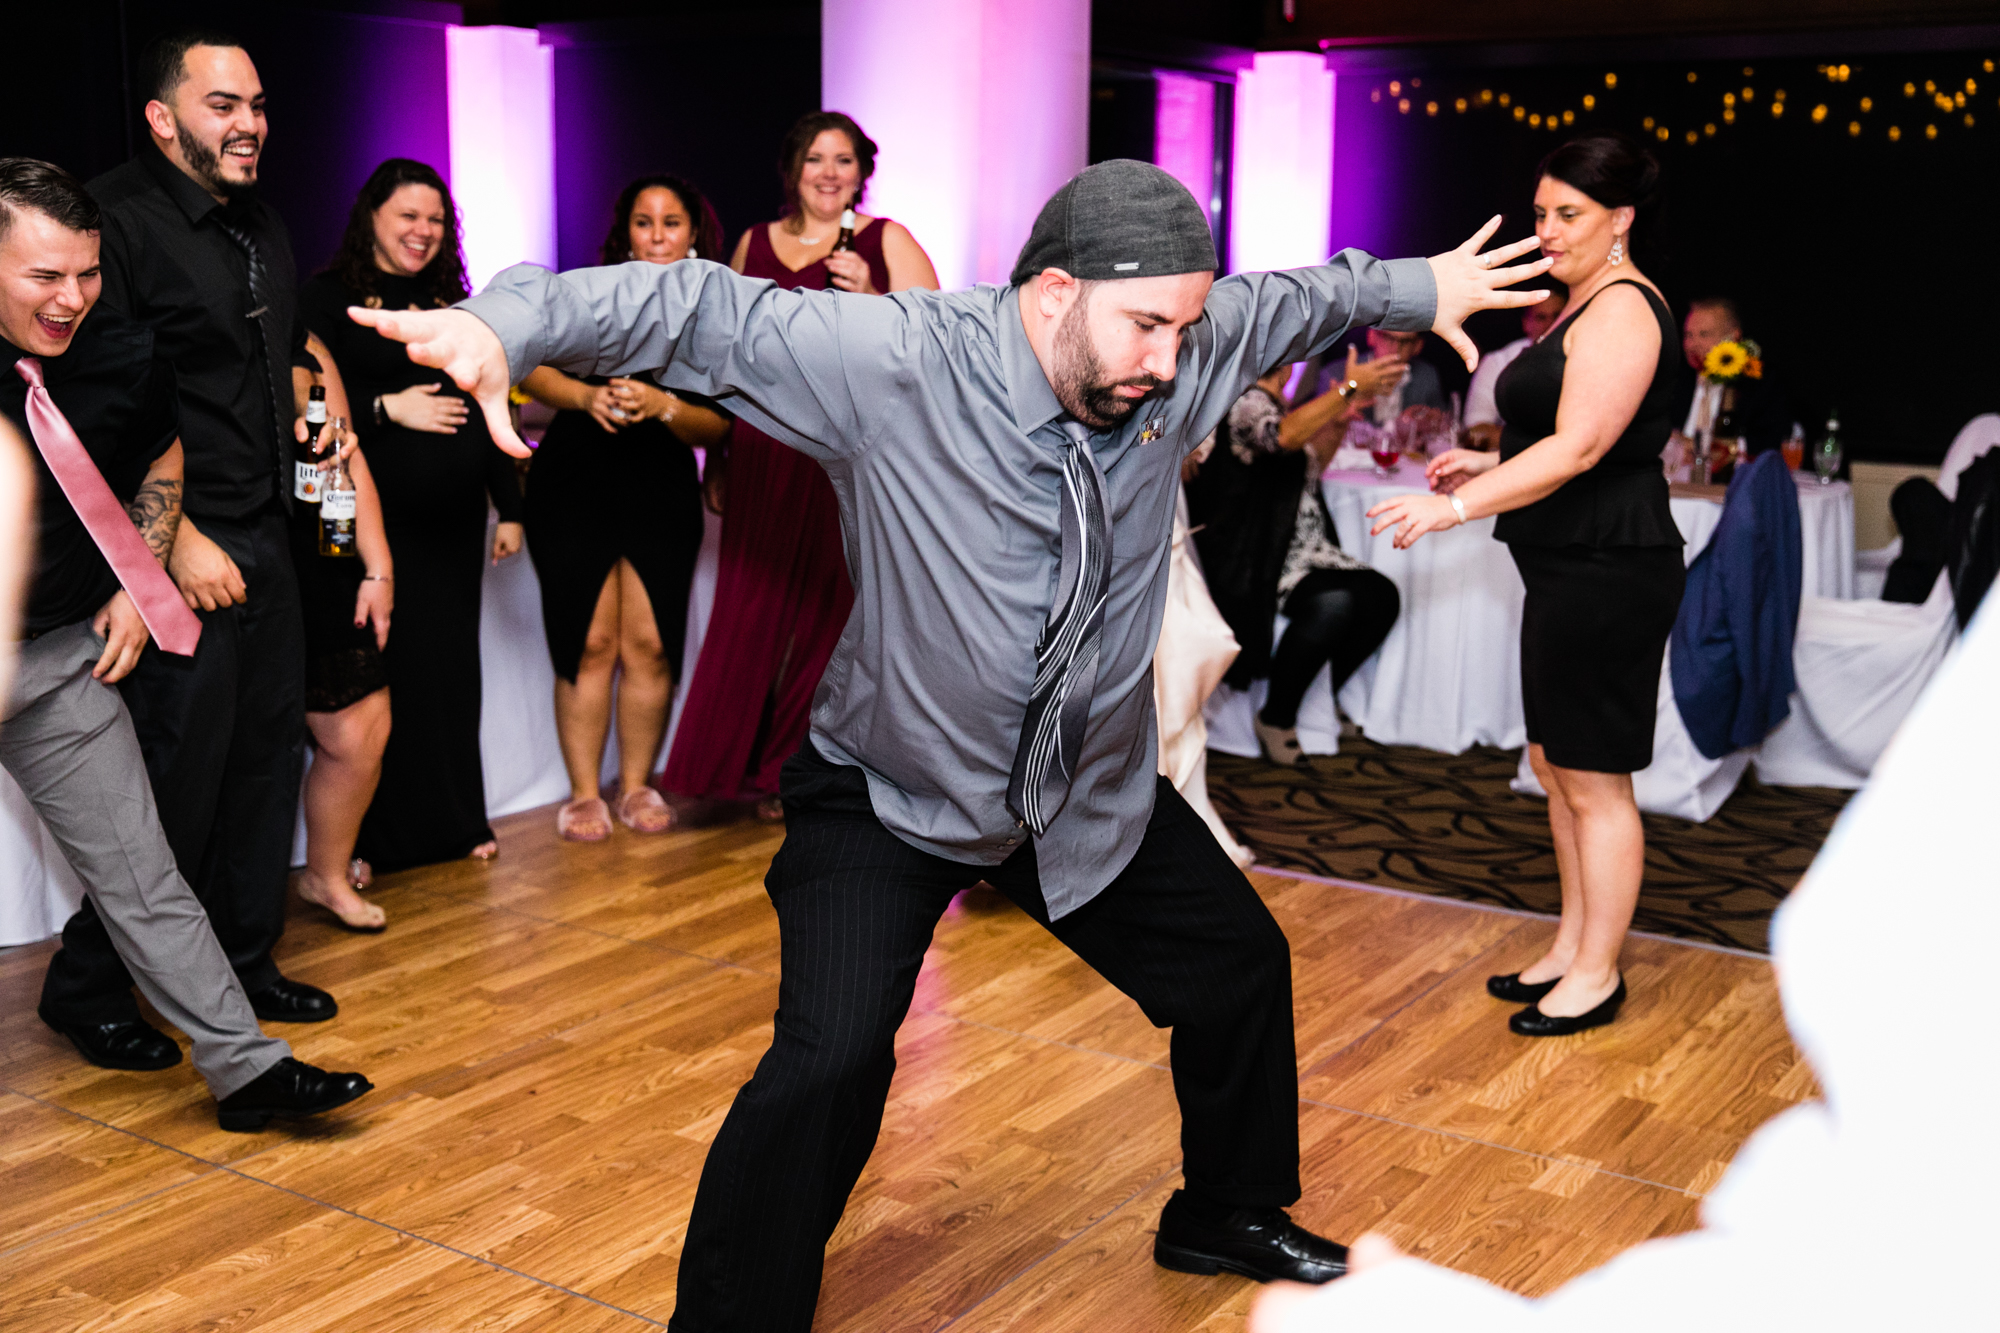 Cedar Brook Country Club Wedding Photography - Lovestruck Pictures-120.jpg